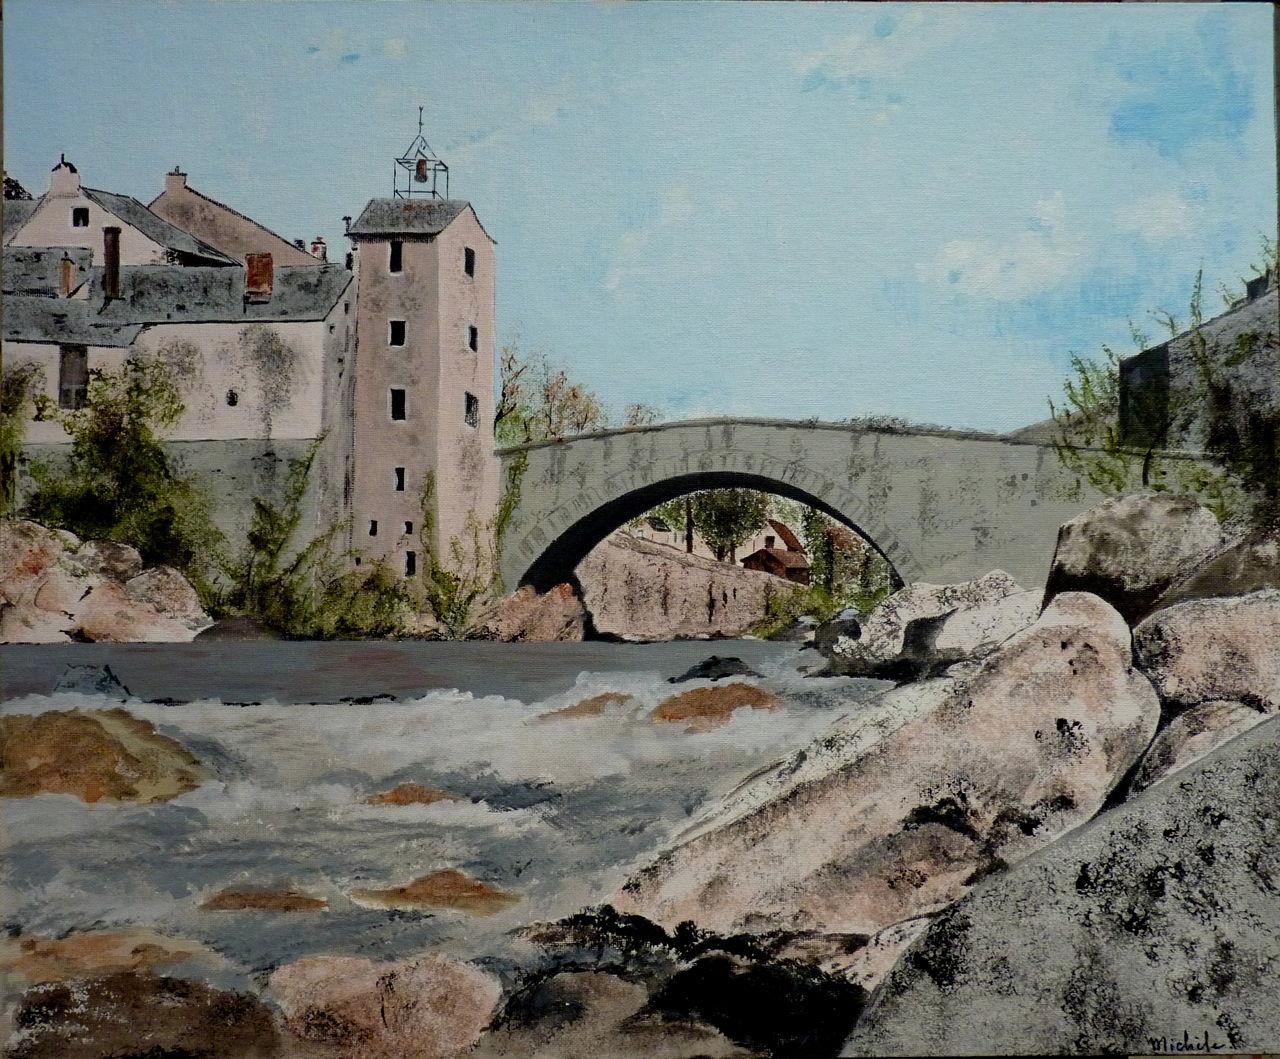 Michele martin Le pont Monvert